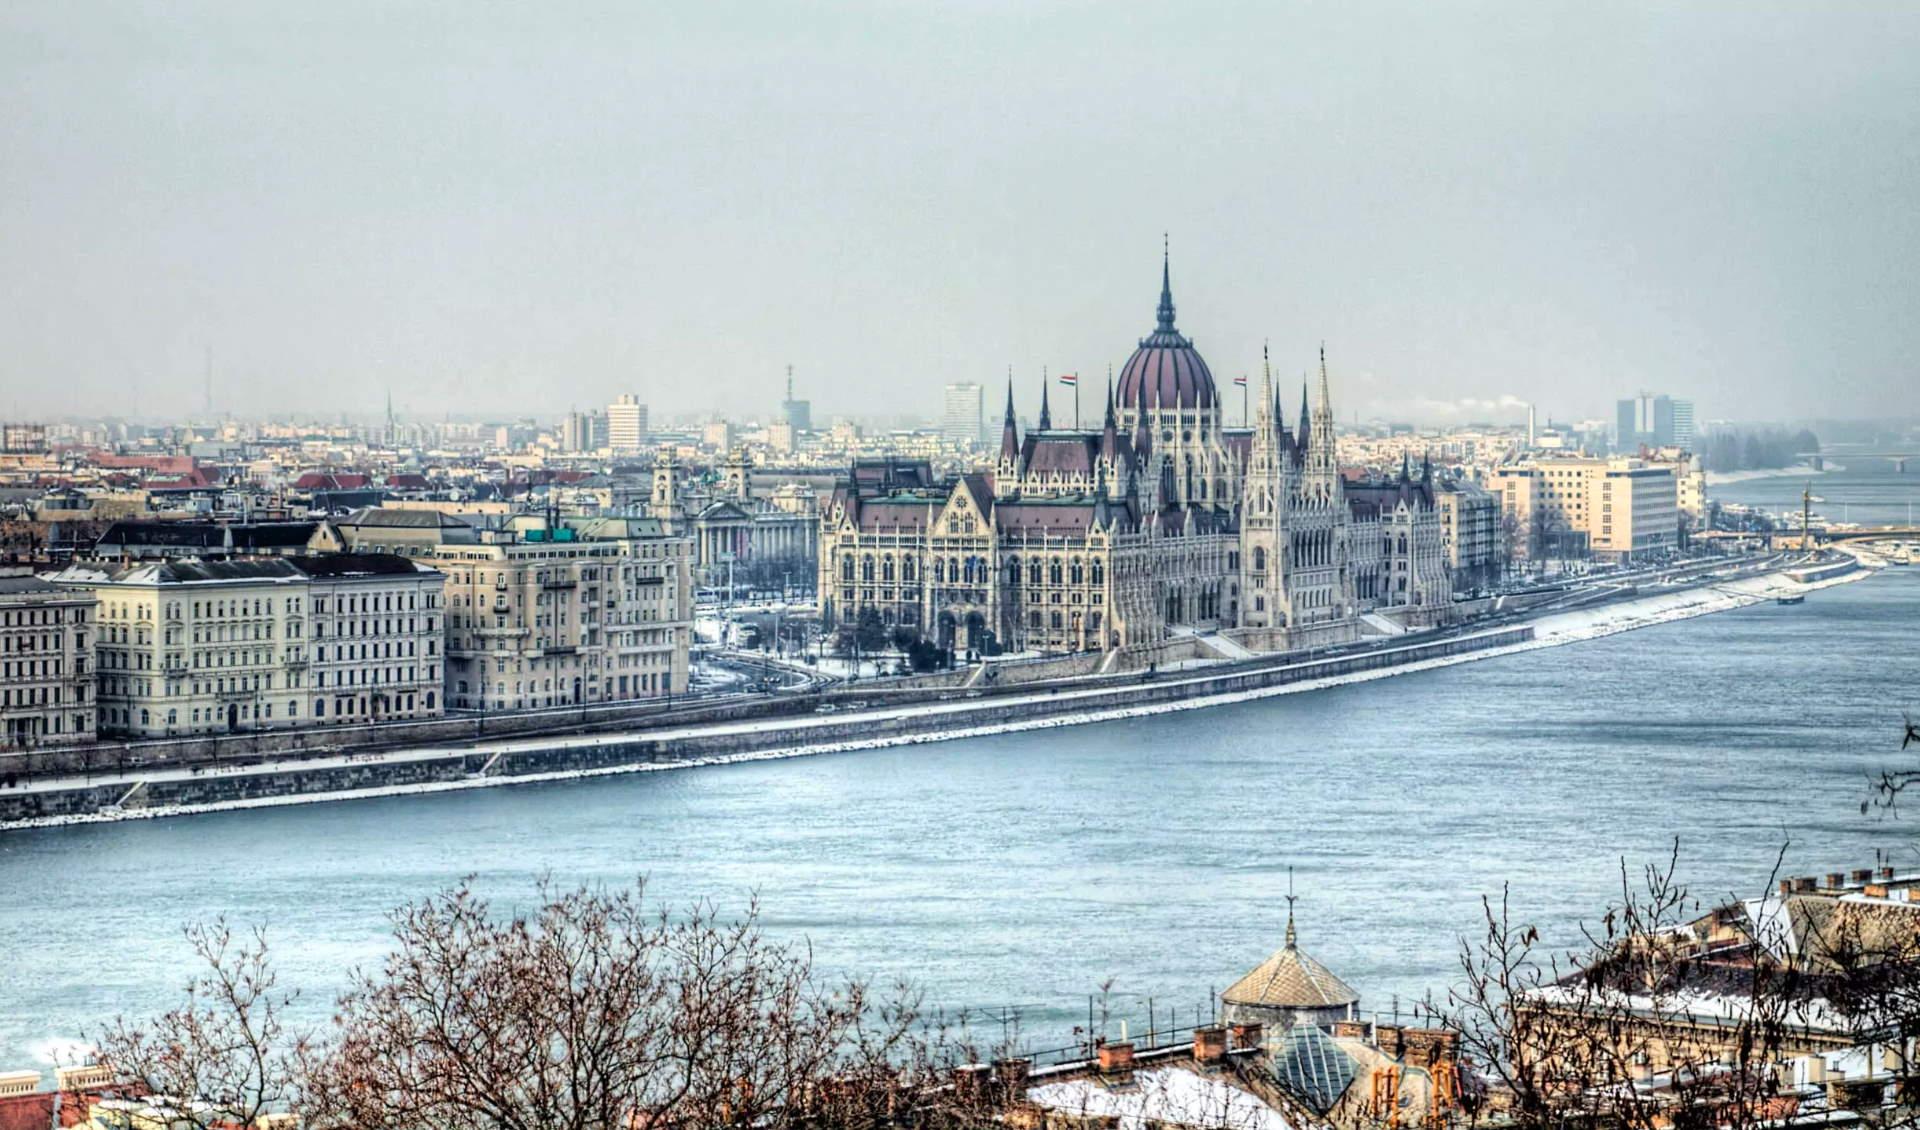 Будапешт в марте погода отзывы